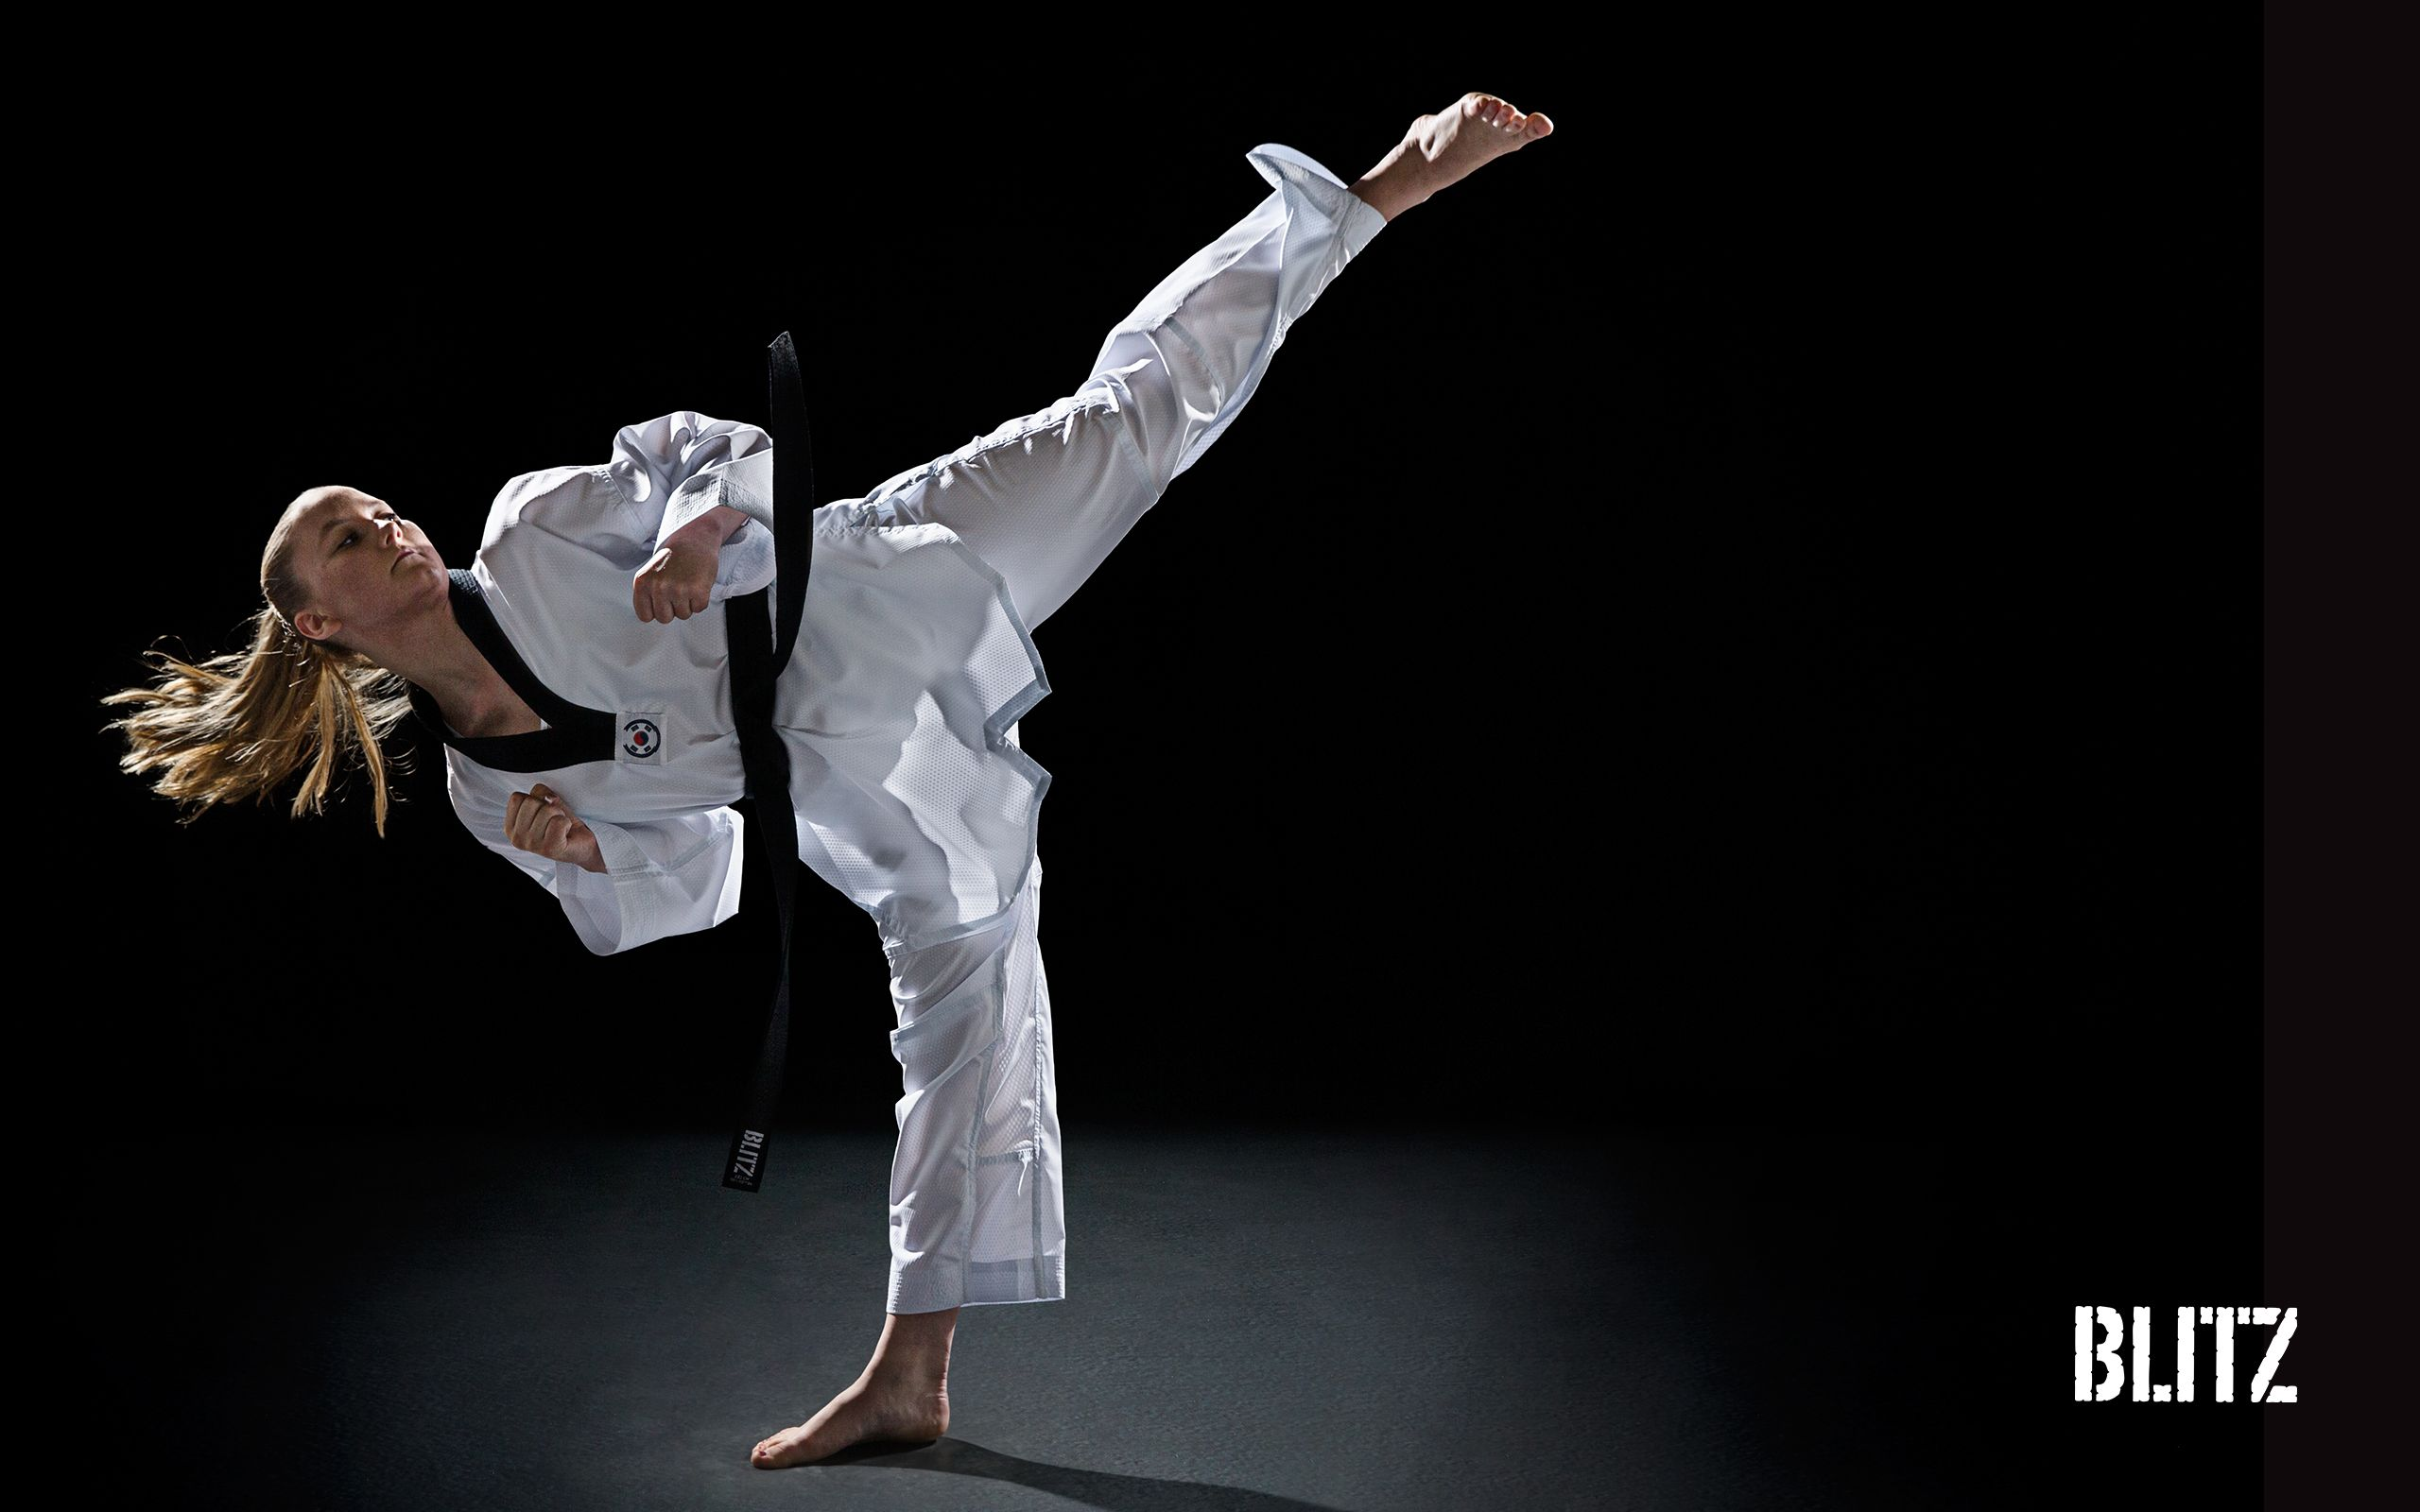 Taekwondo Free Hd Desktop And Mobile Wallpaper Wallpaperplay